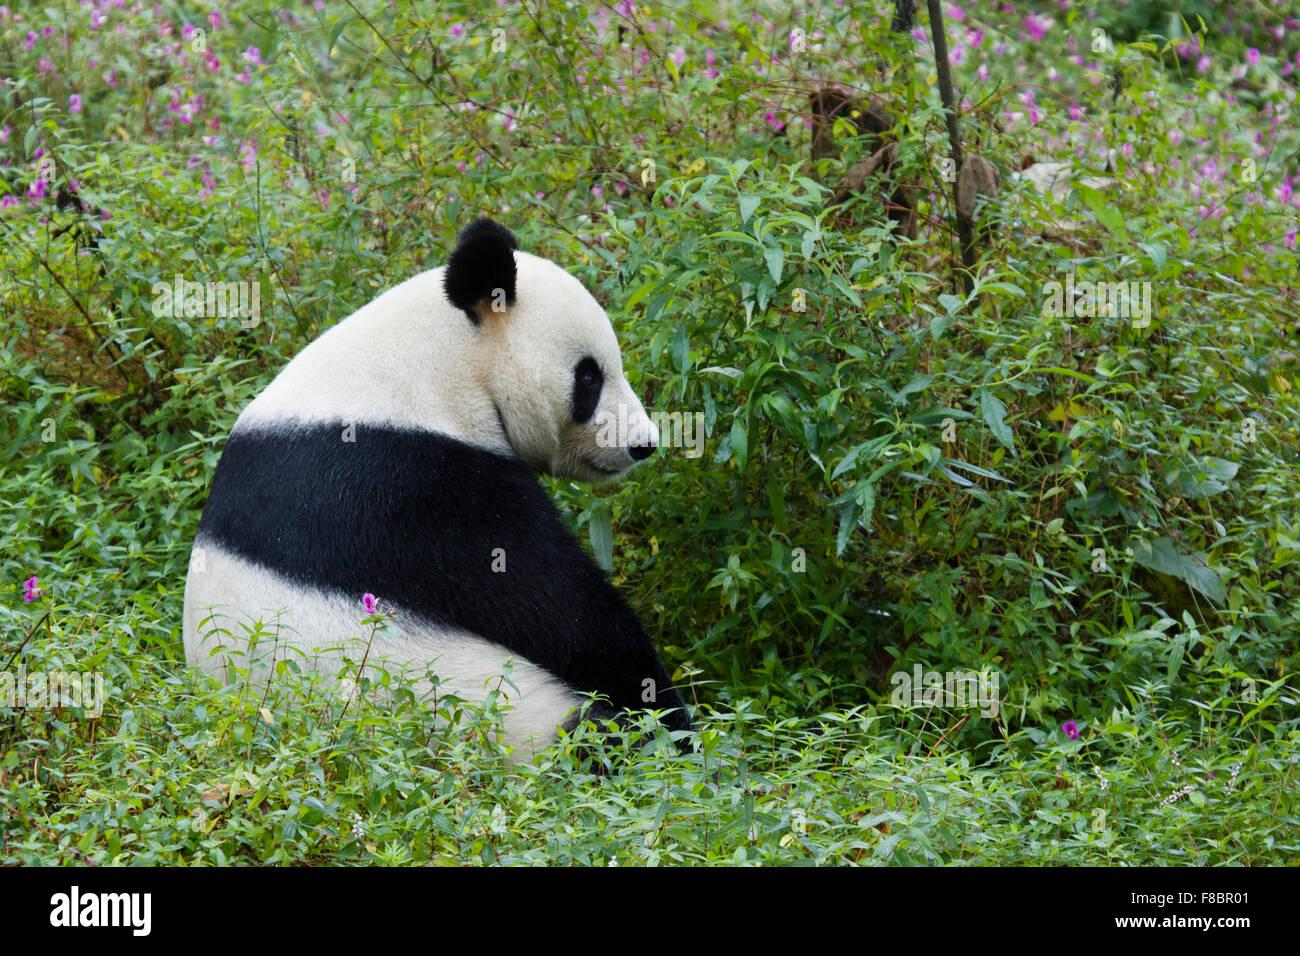 Panda Ailuropoda melanoleuca Bifengxia Panda Base nella provincia del Sichuan in Cina MA003073 Immagini Stock